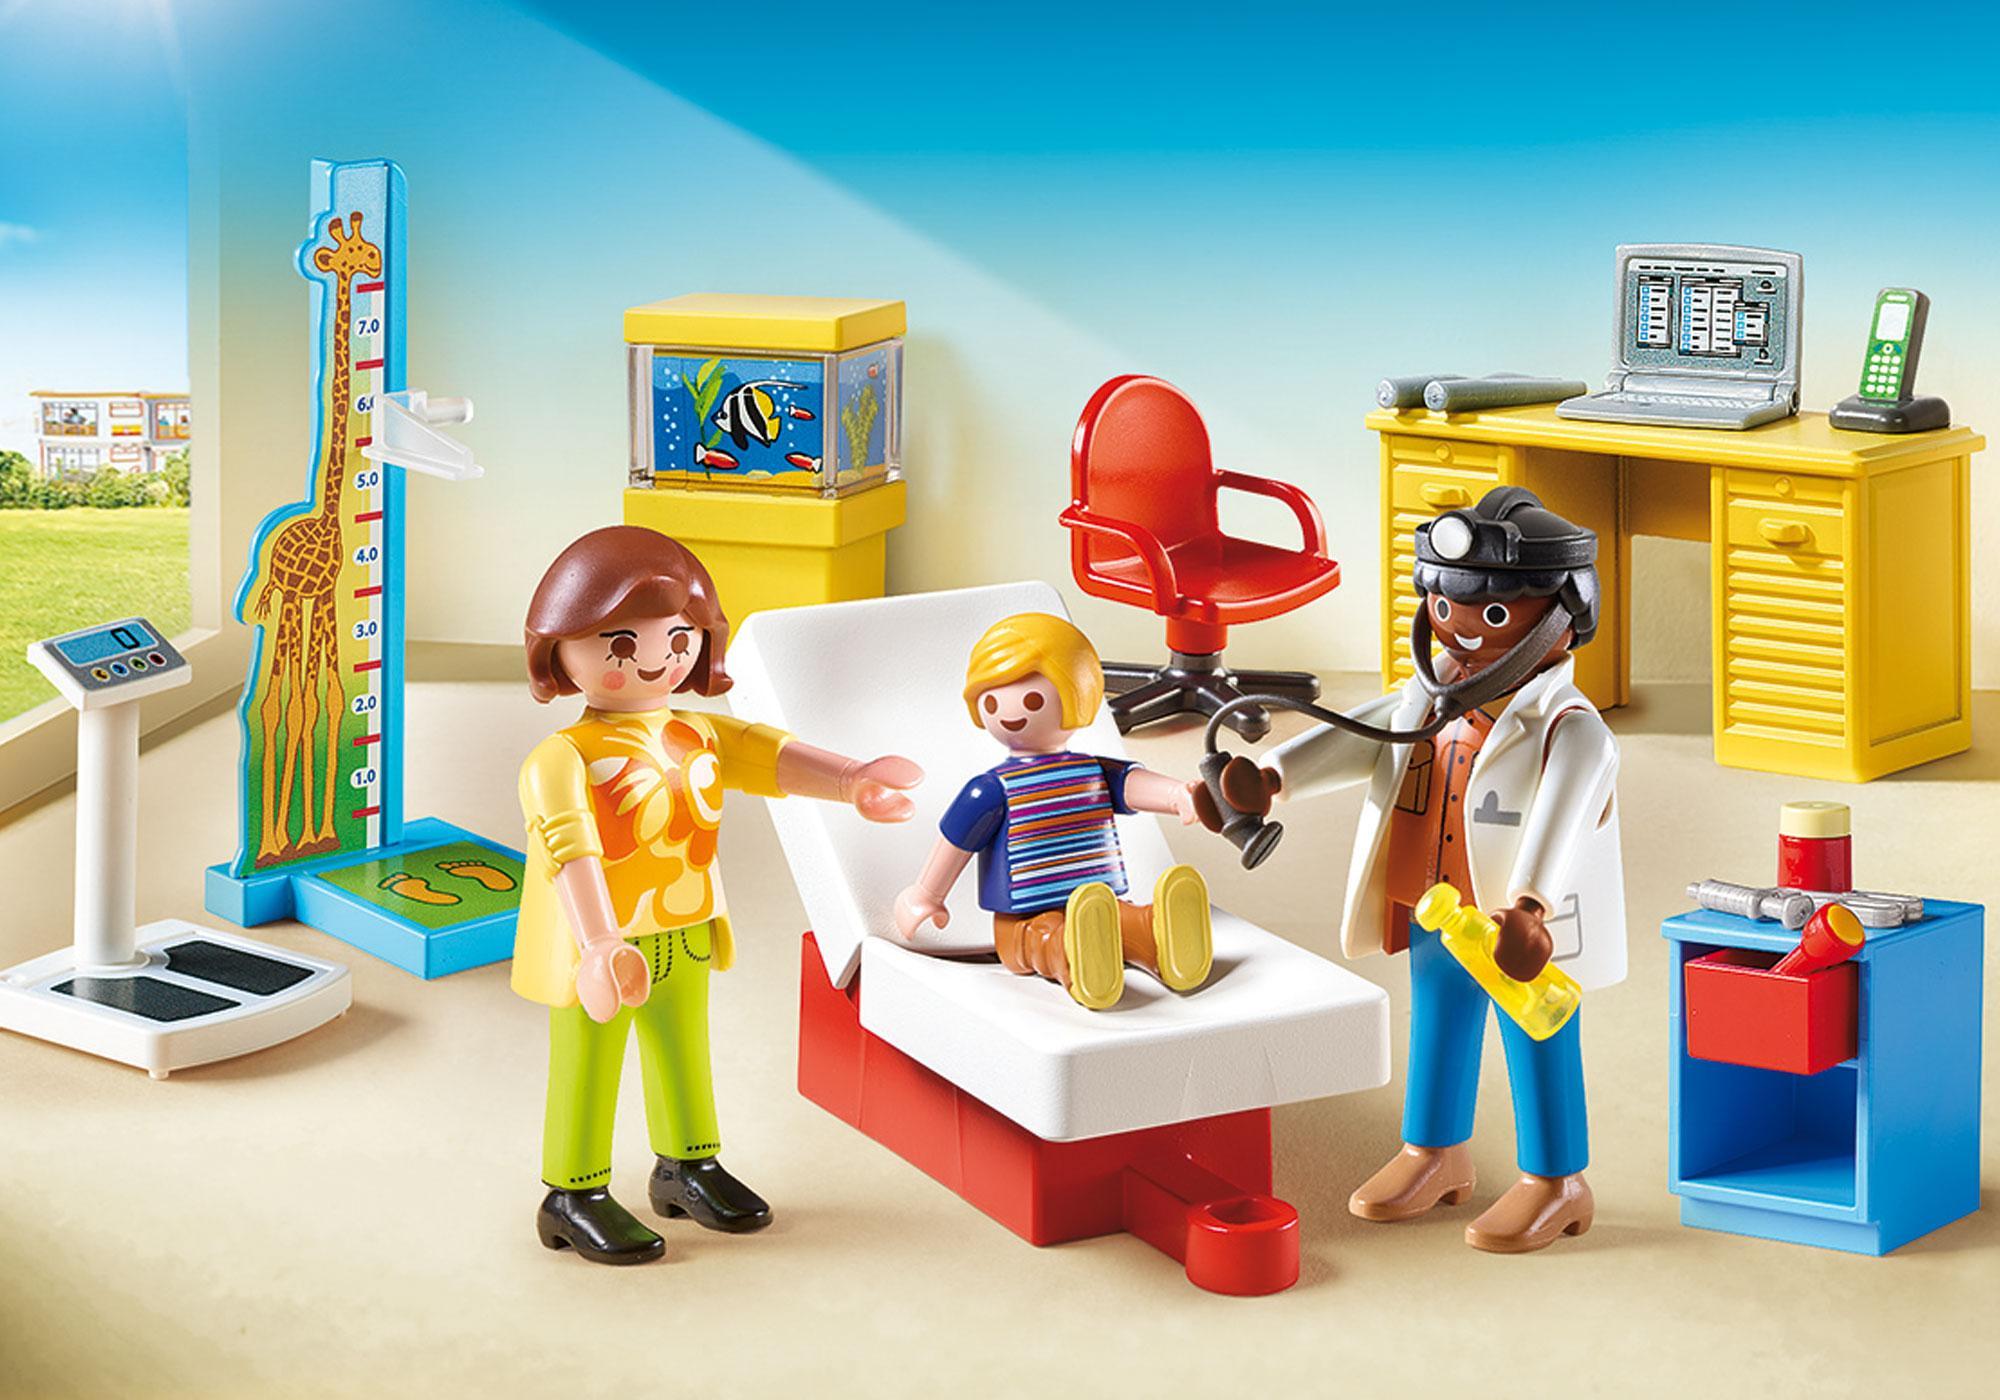 70034_product_detail/StarterPack Beim Kinderarzt